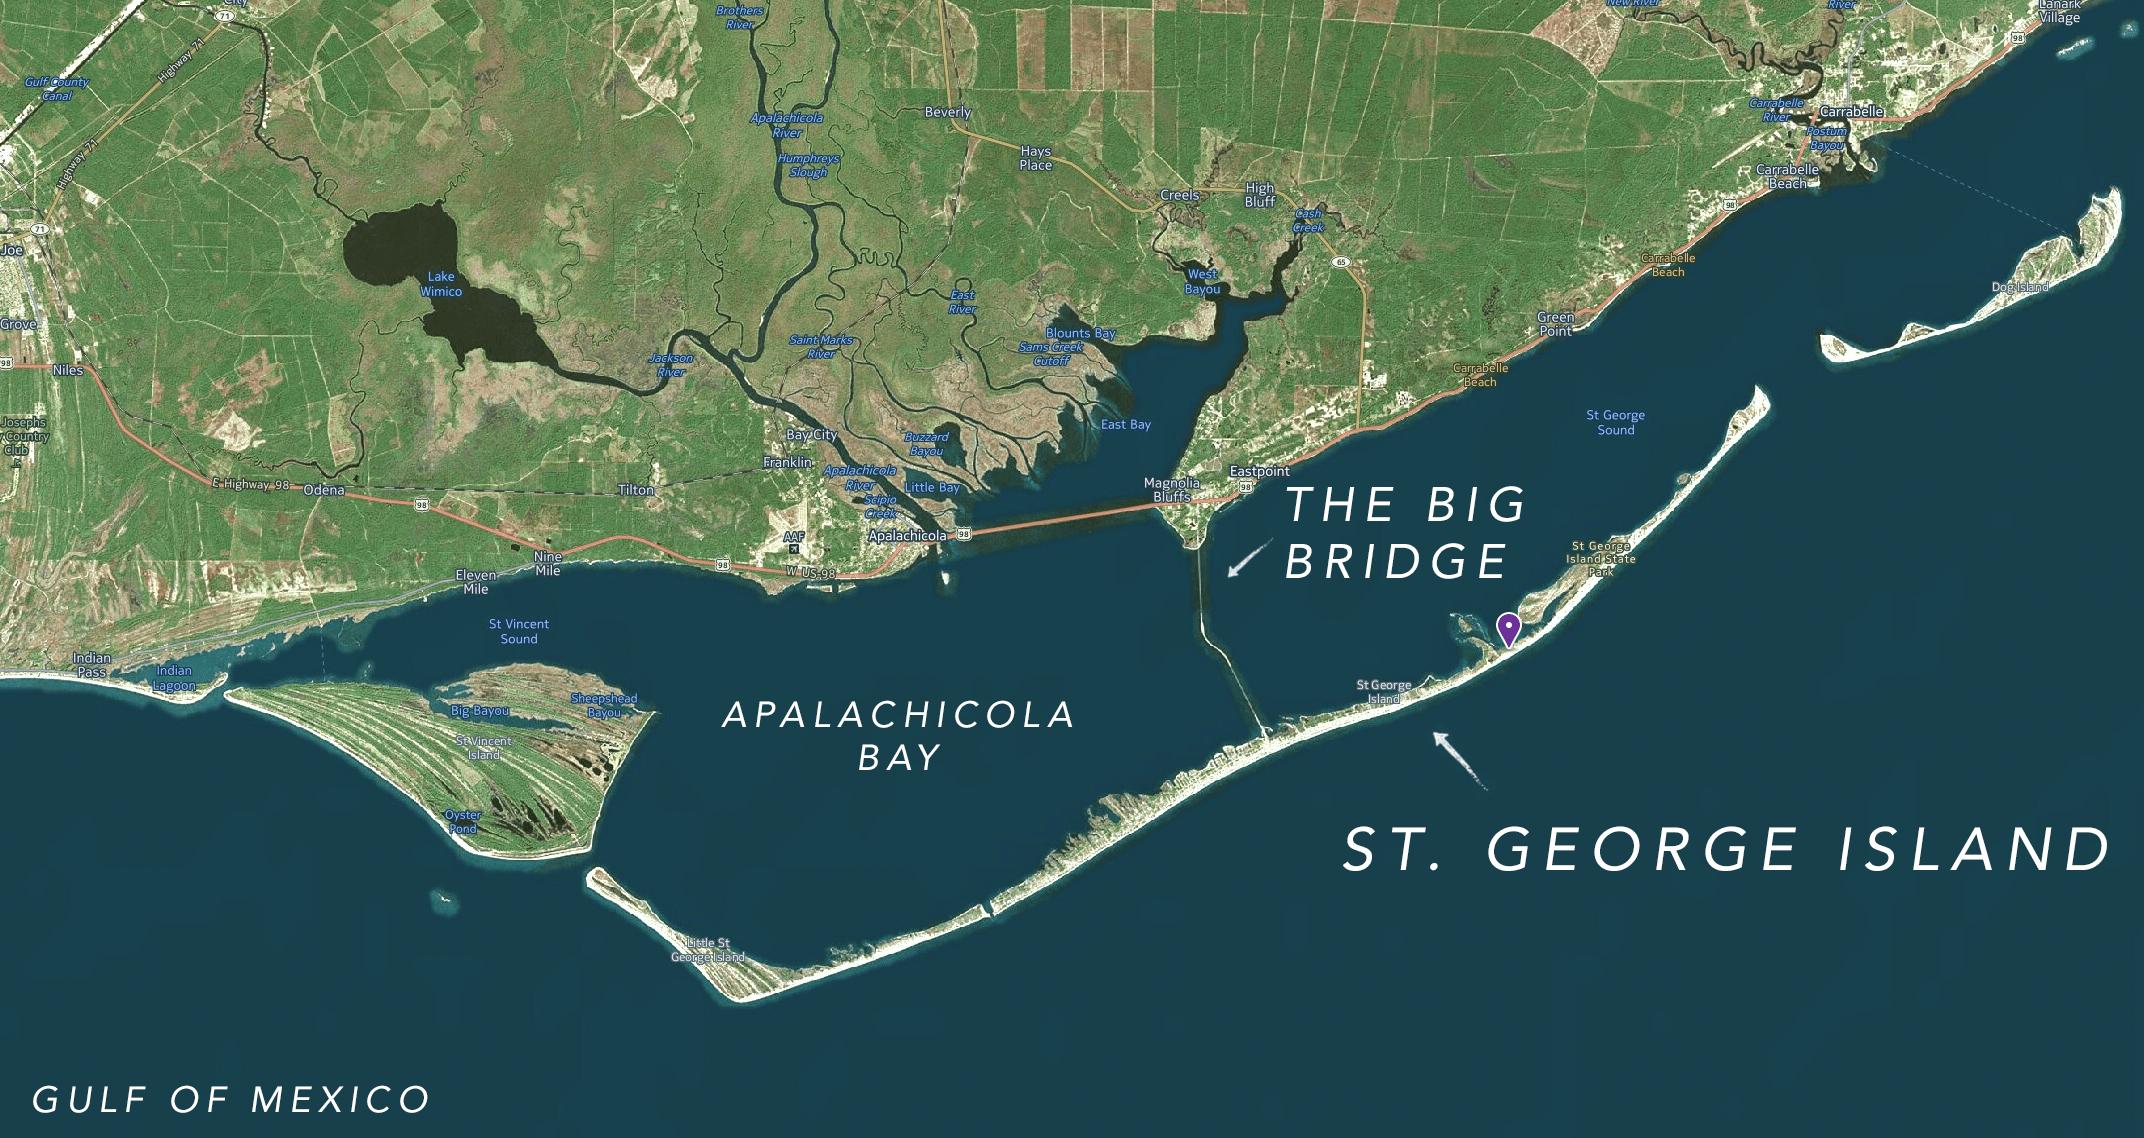 St George Island Florida Map.Florida Map St George Island Verkuilenschaaij